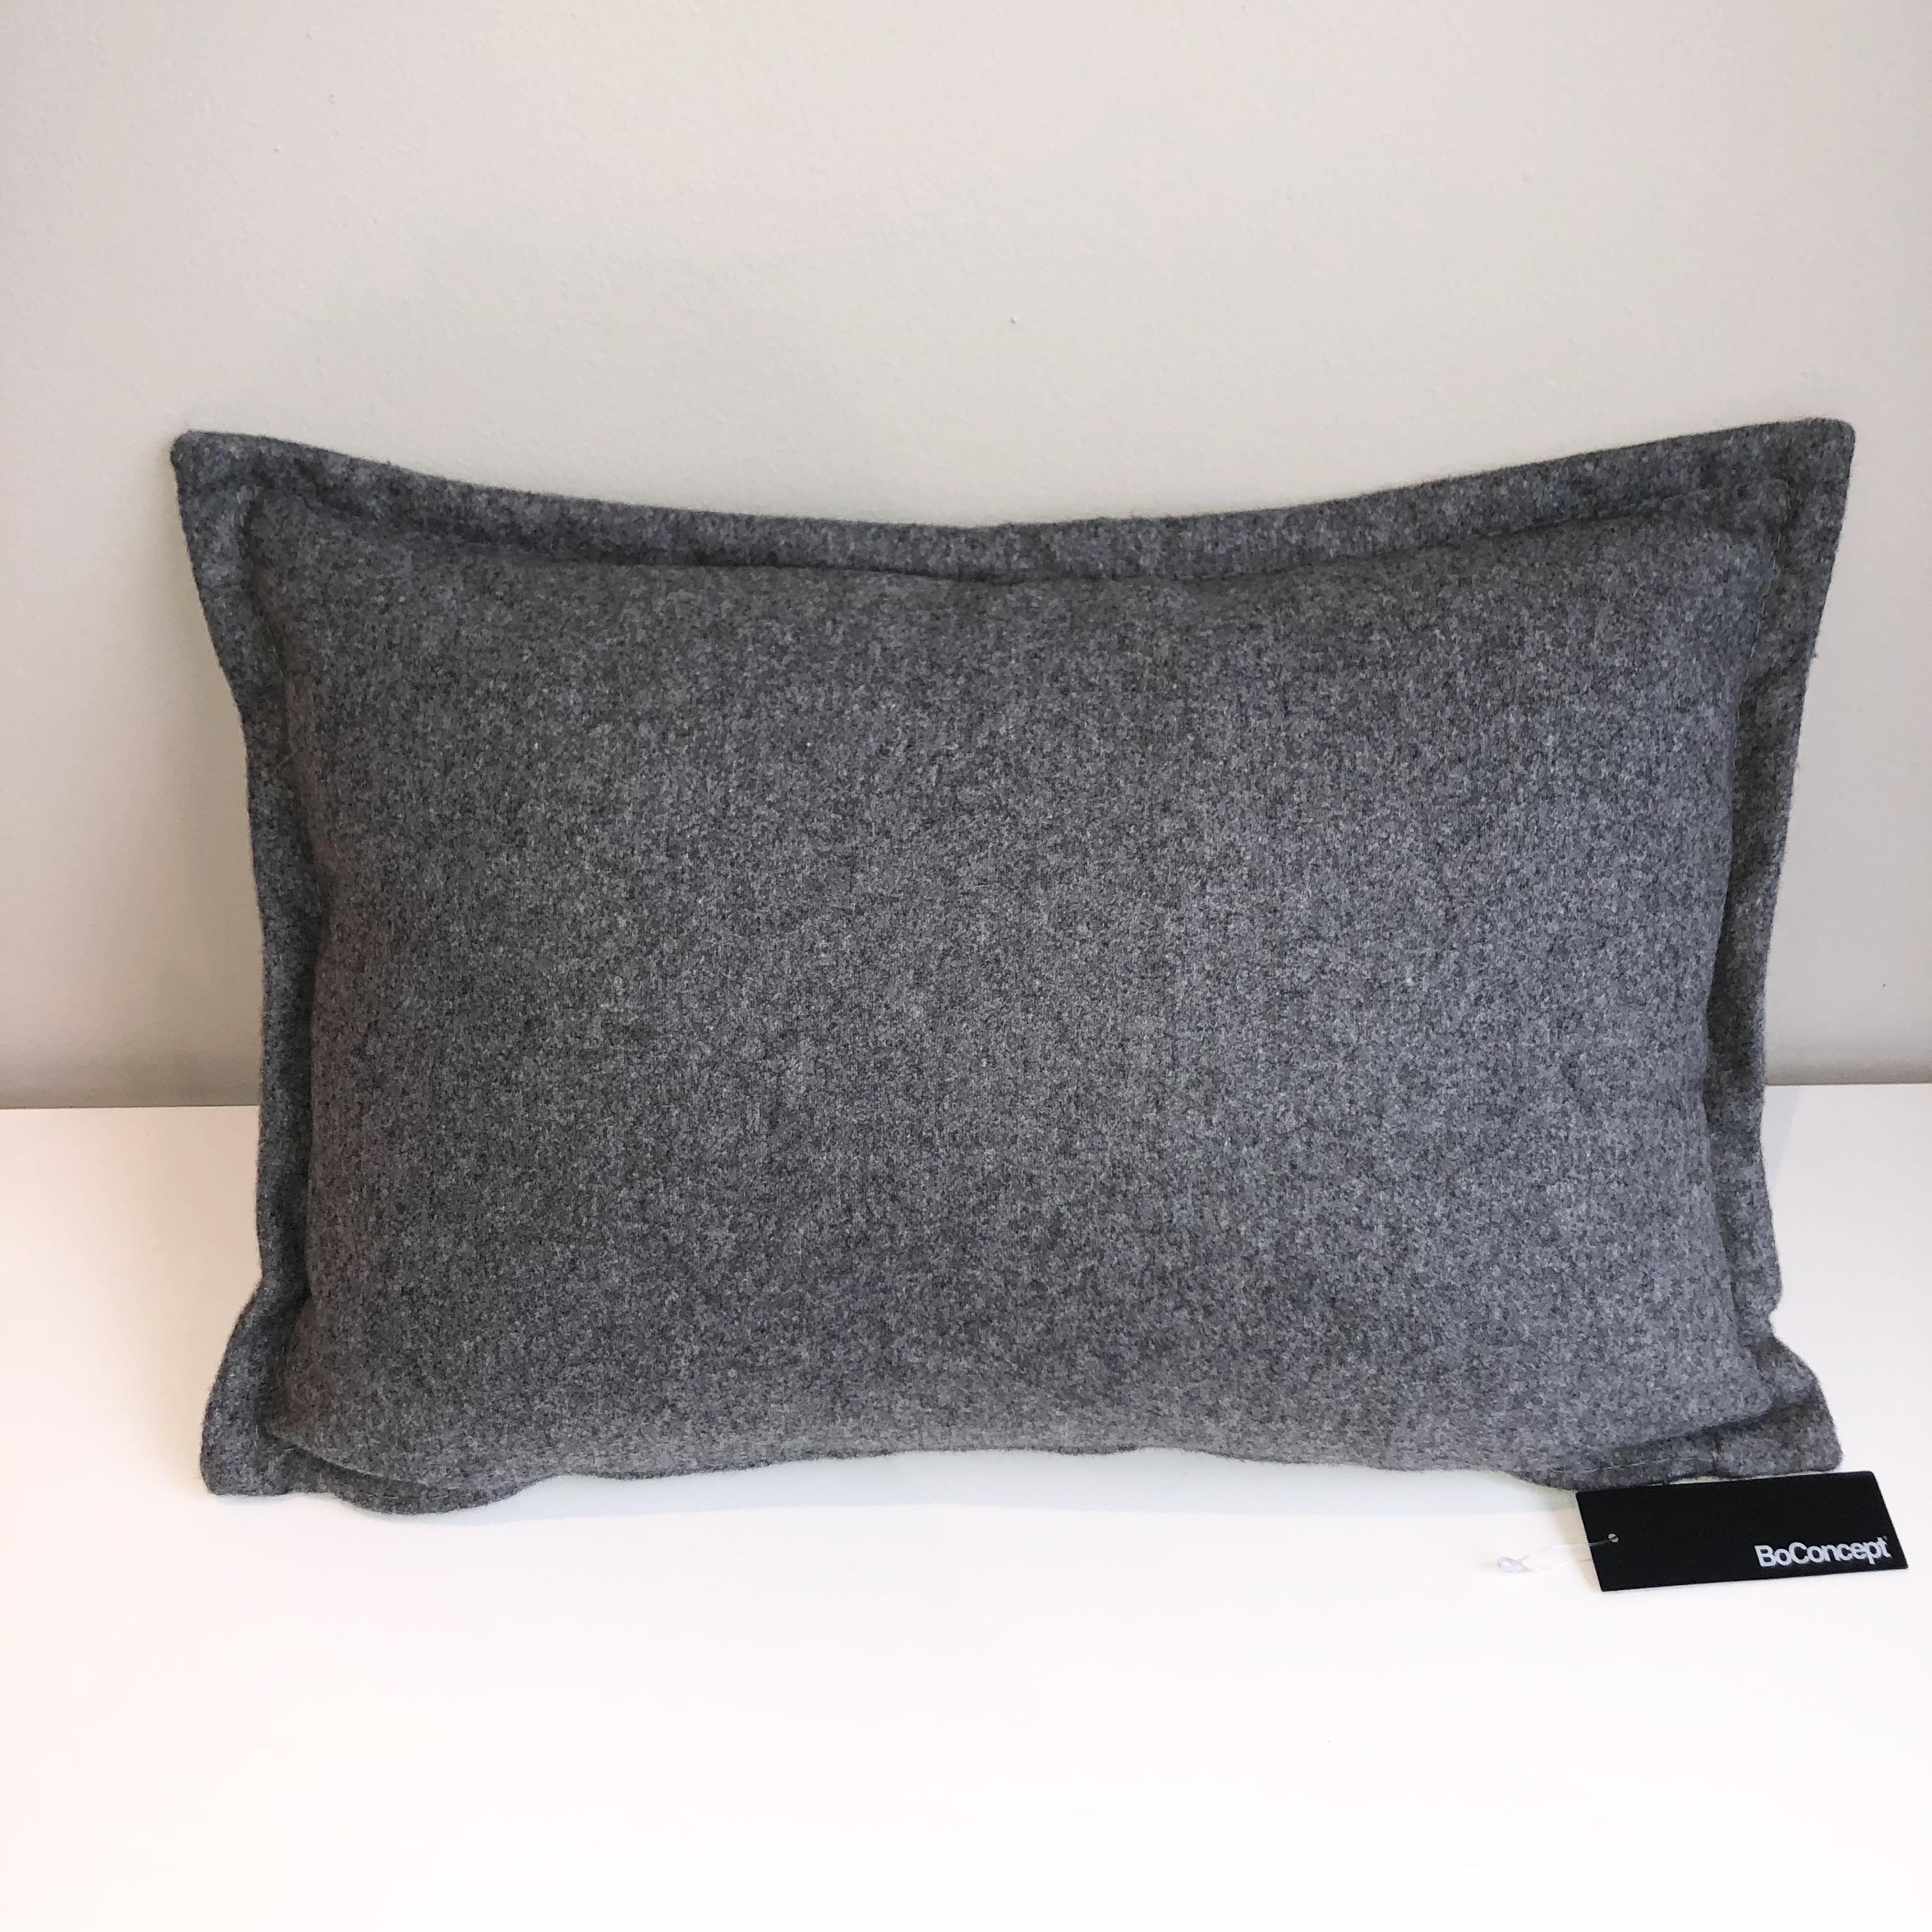 LuxFelt Cushion